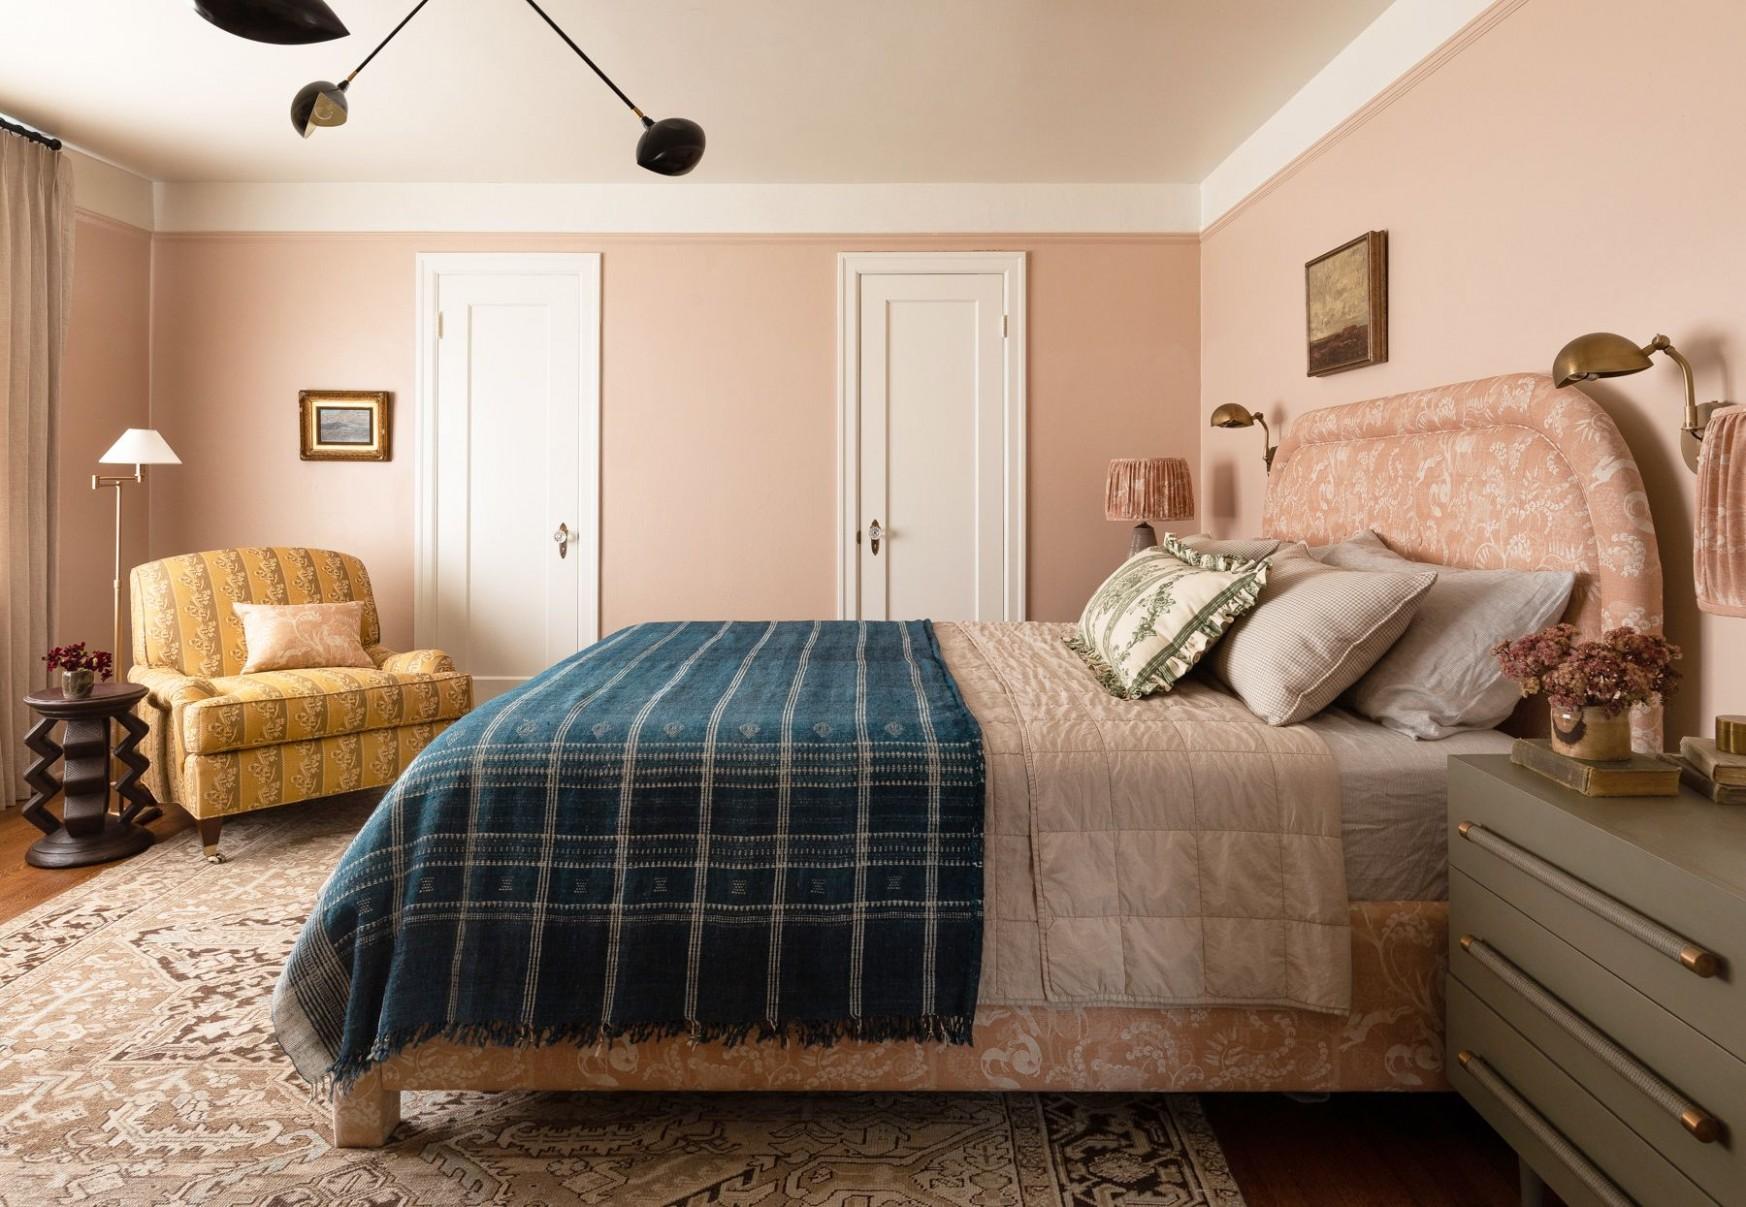 9 Best Bedroom Colors 9 - Paint Color Ideas for Bedrooms - Bedroom Colour Ideas